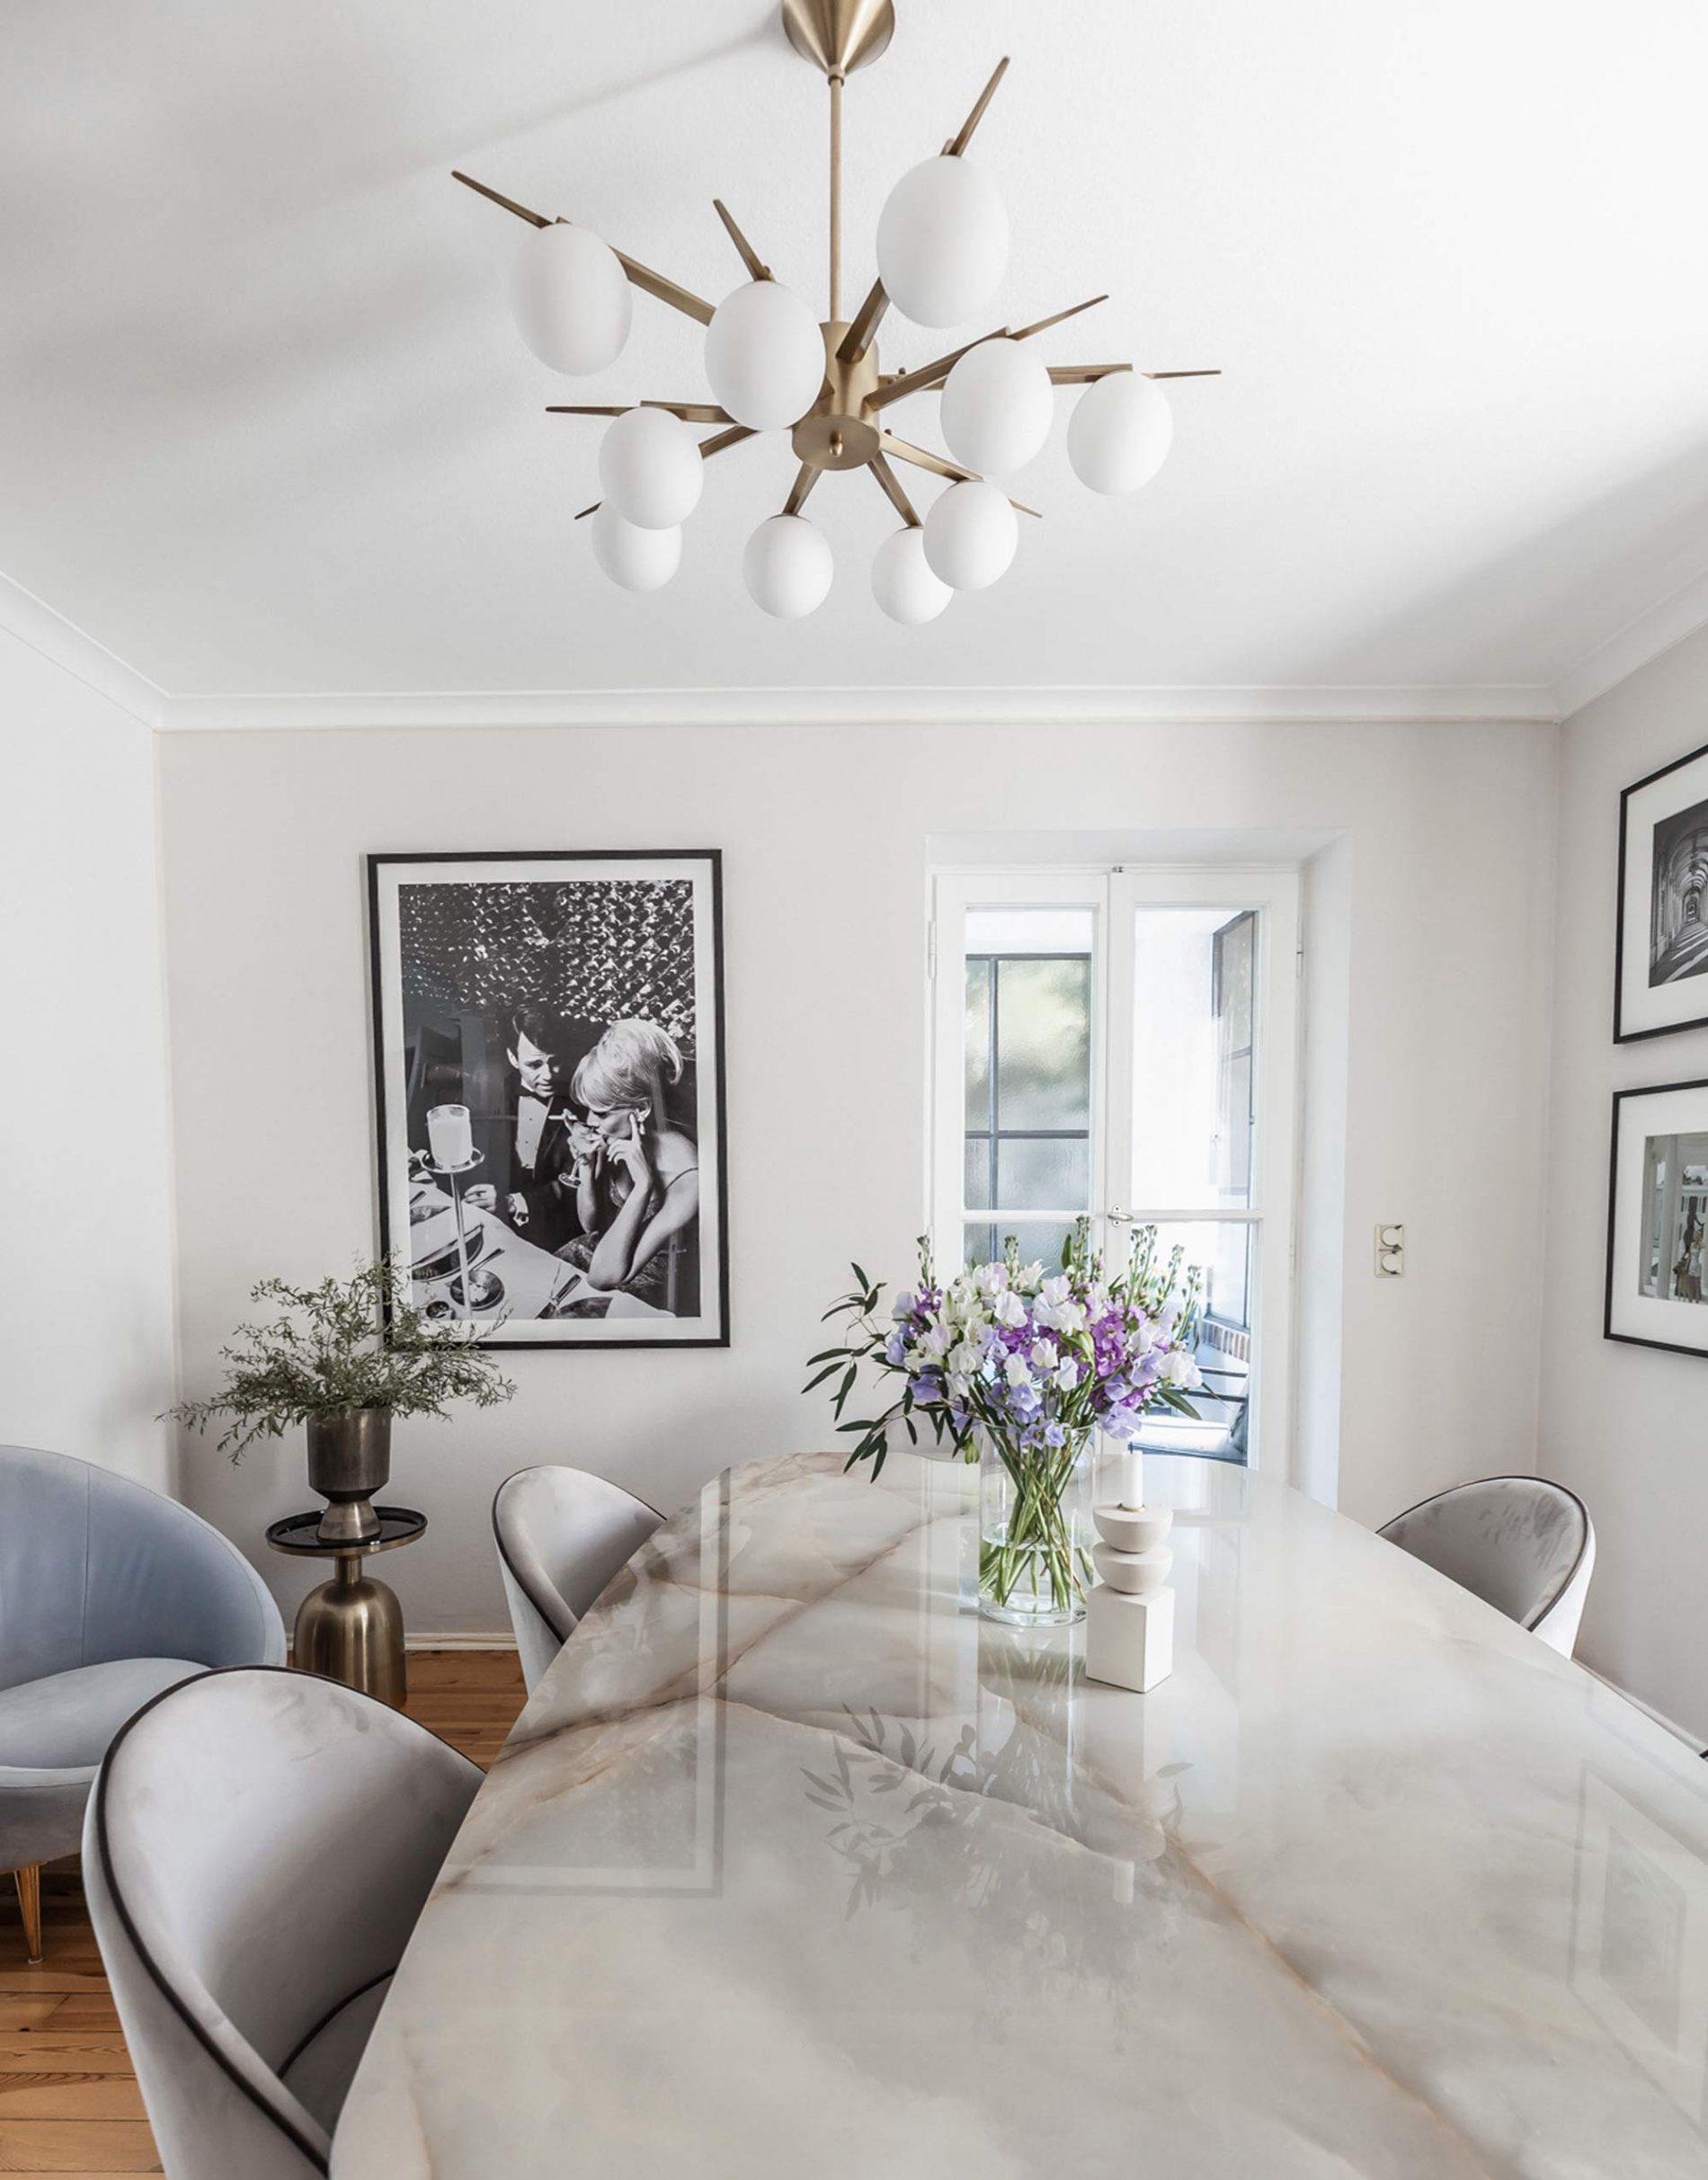 katarina-fischer-interior-dining-room-1